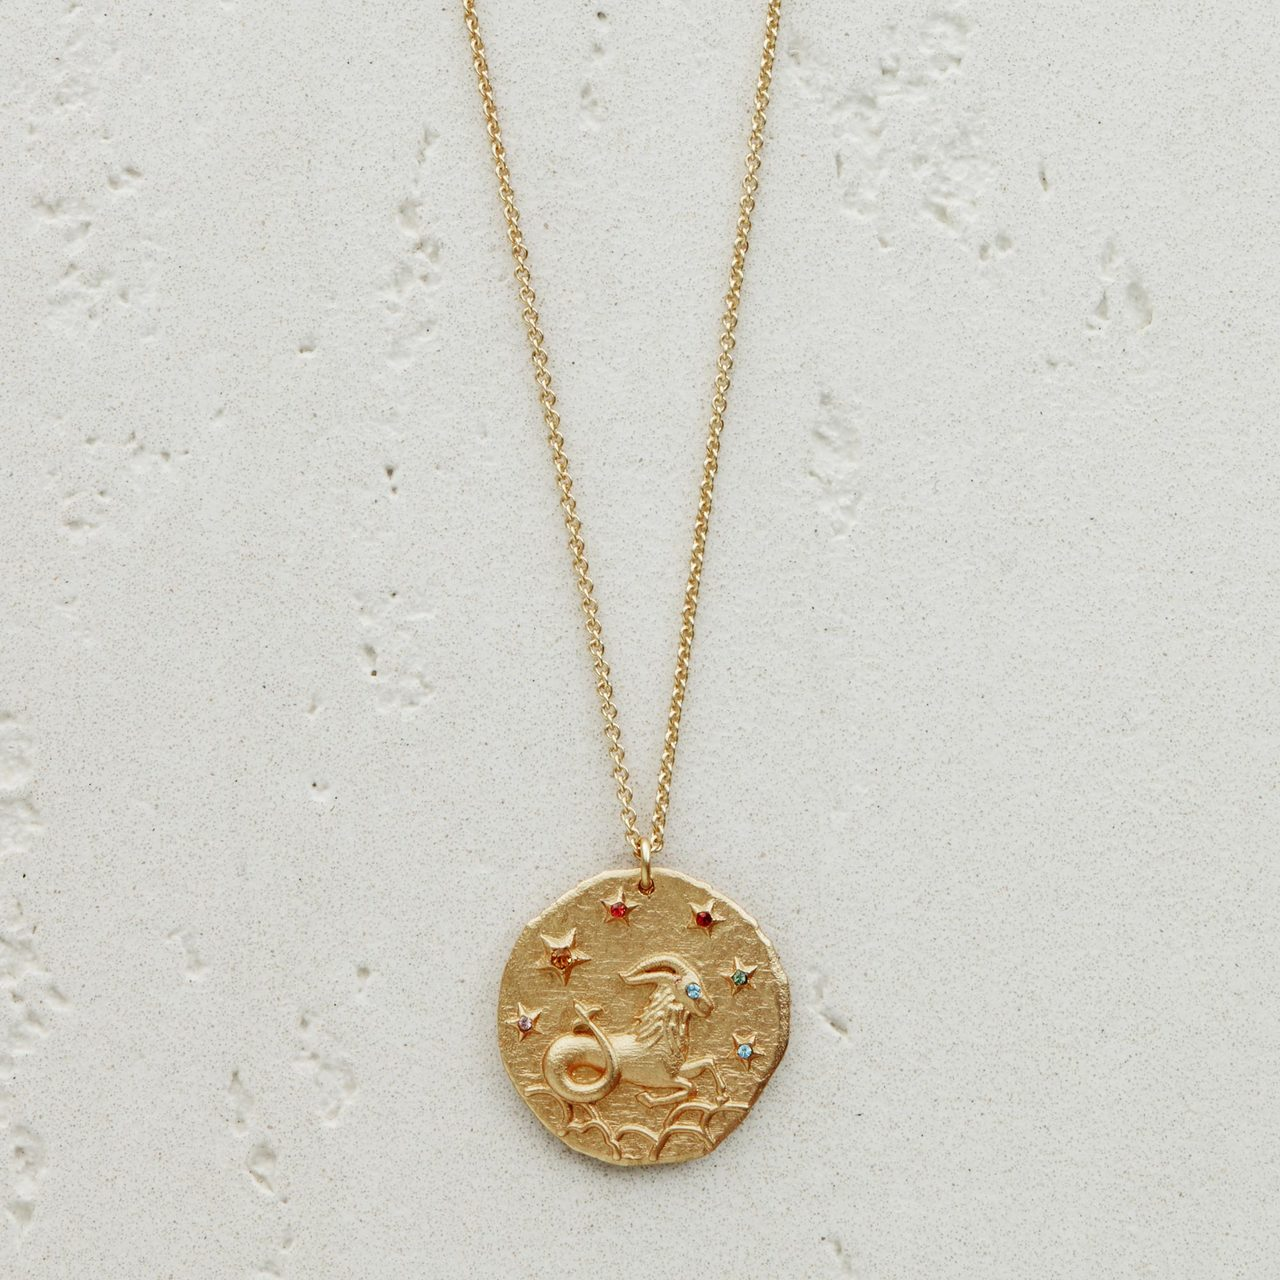 CapricornZodiac Sign Necklace - Gold